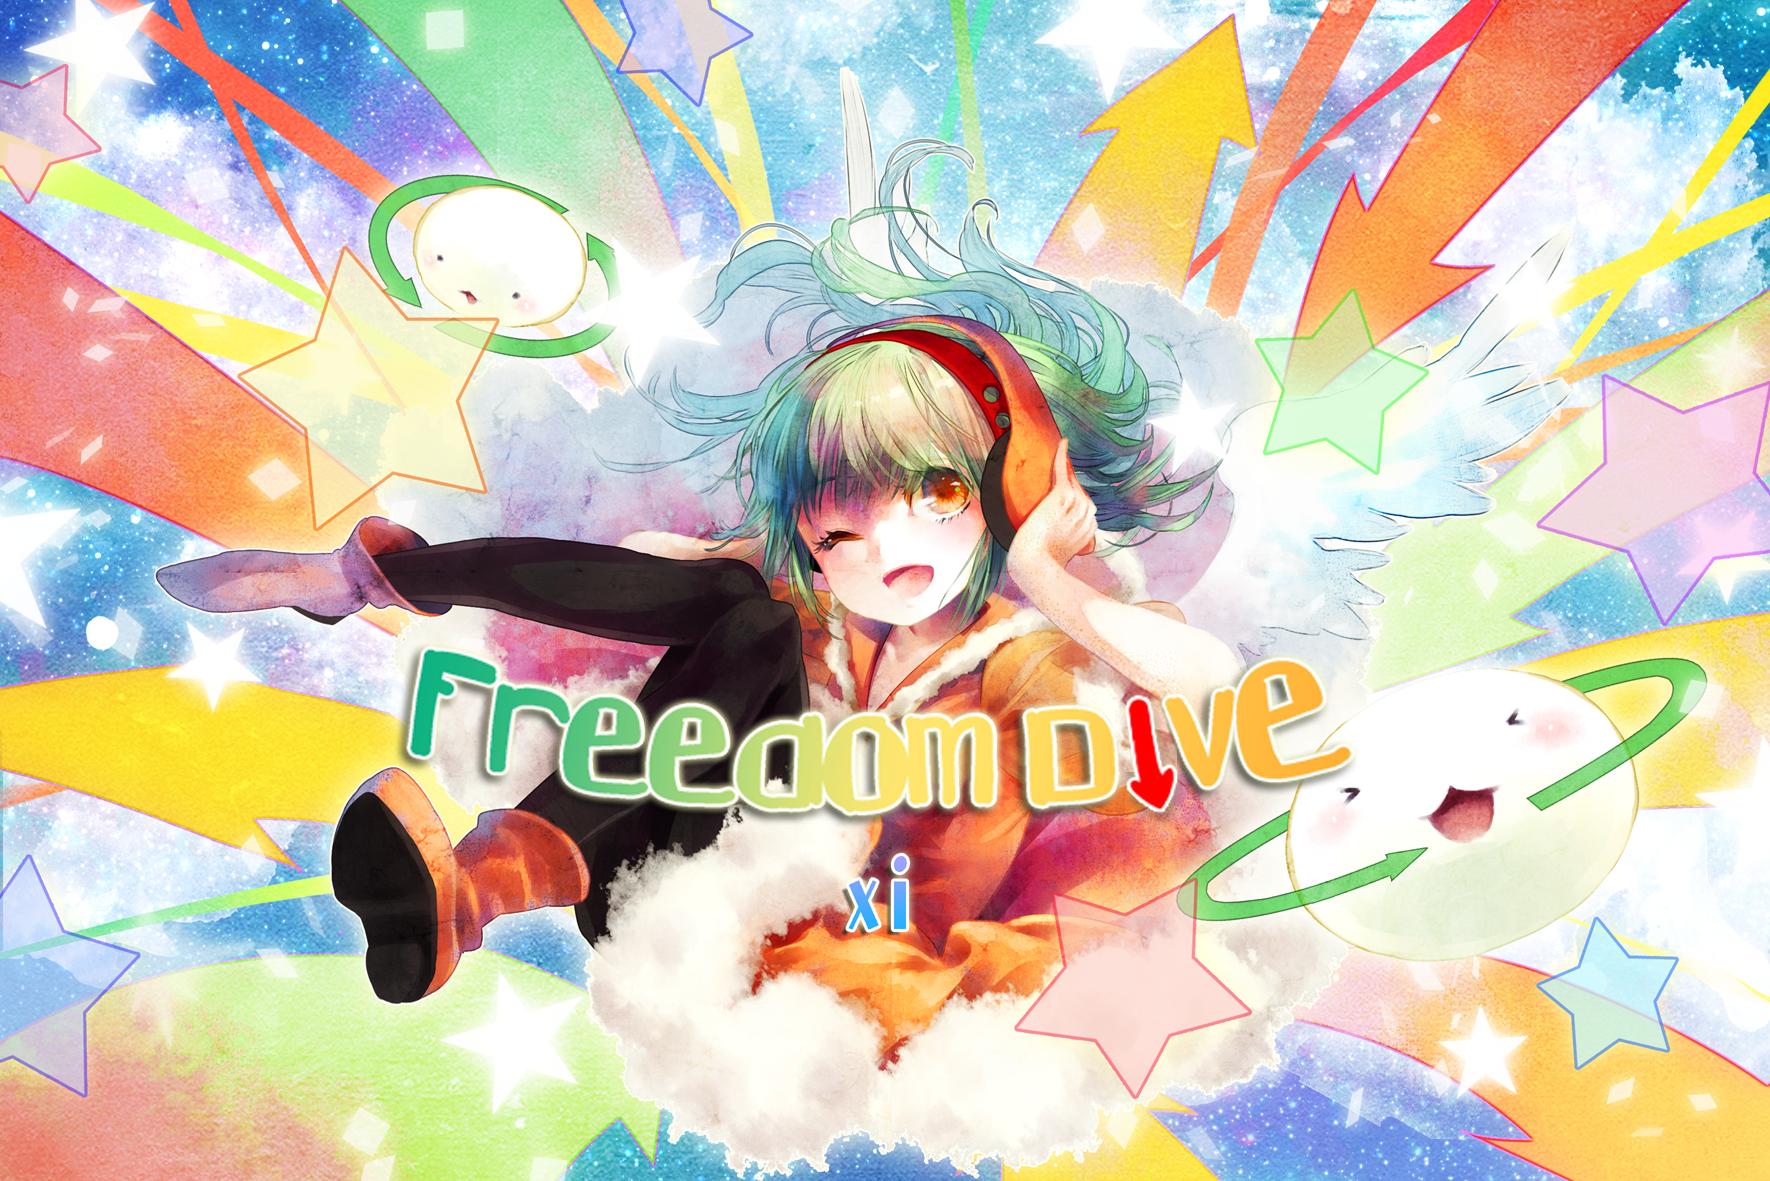 Freedom D↓ve